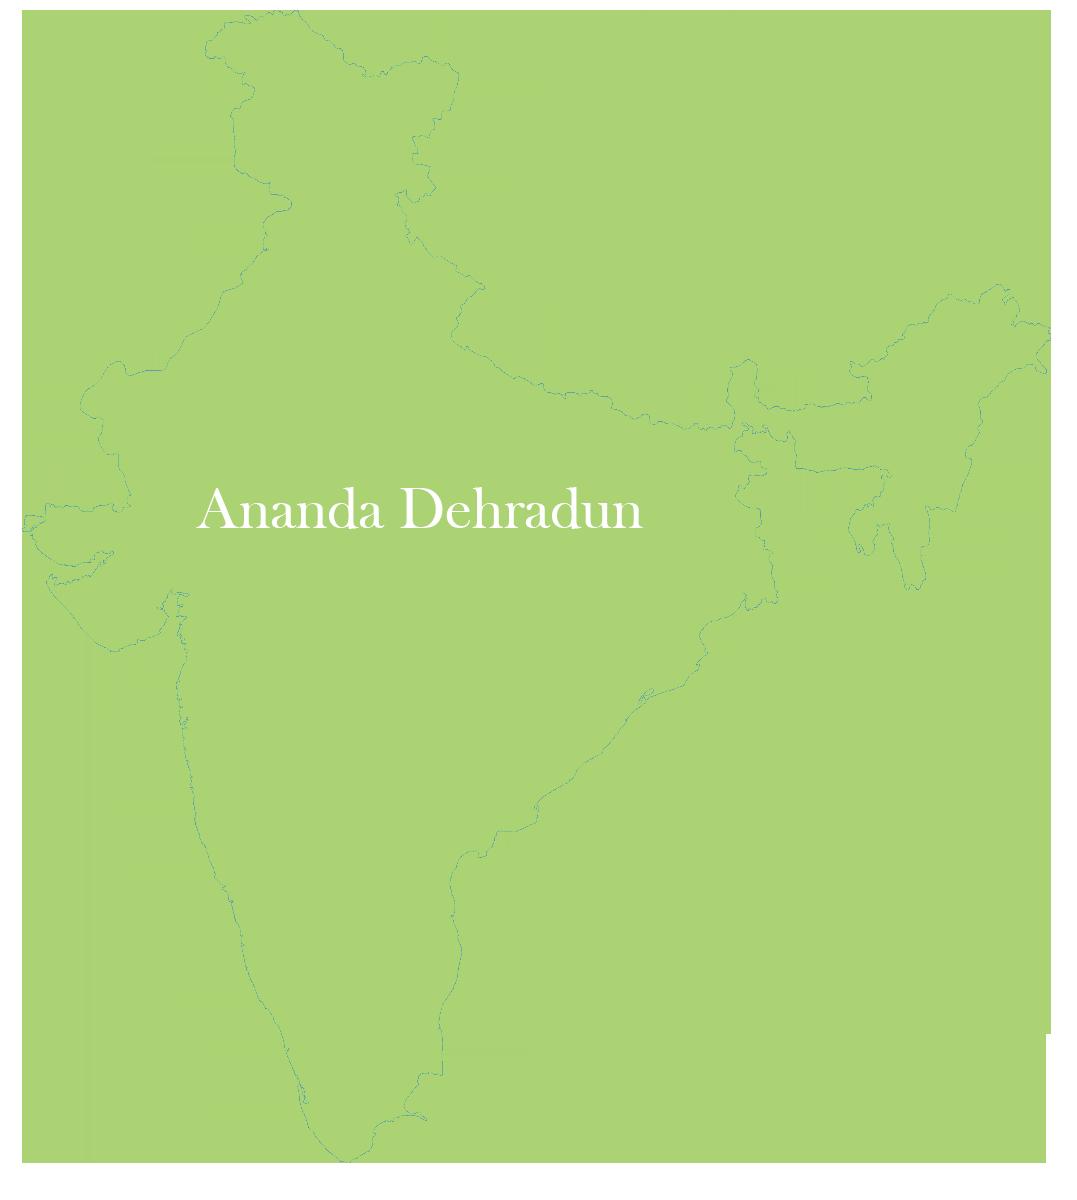 Ananda Dehradun